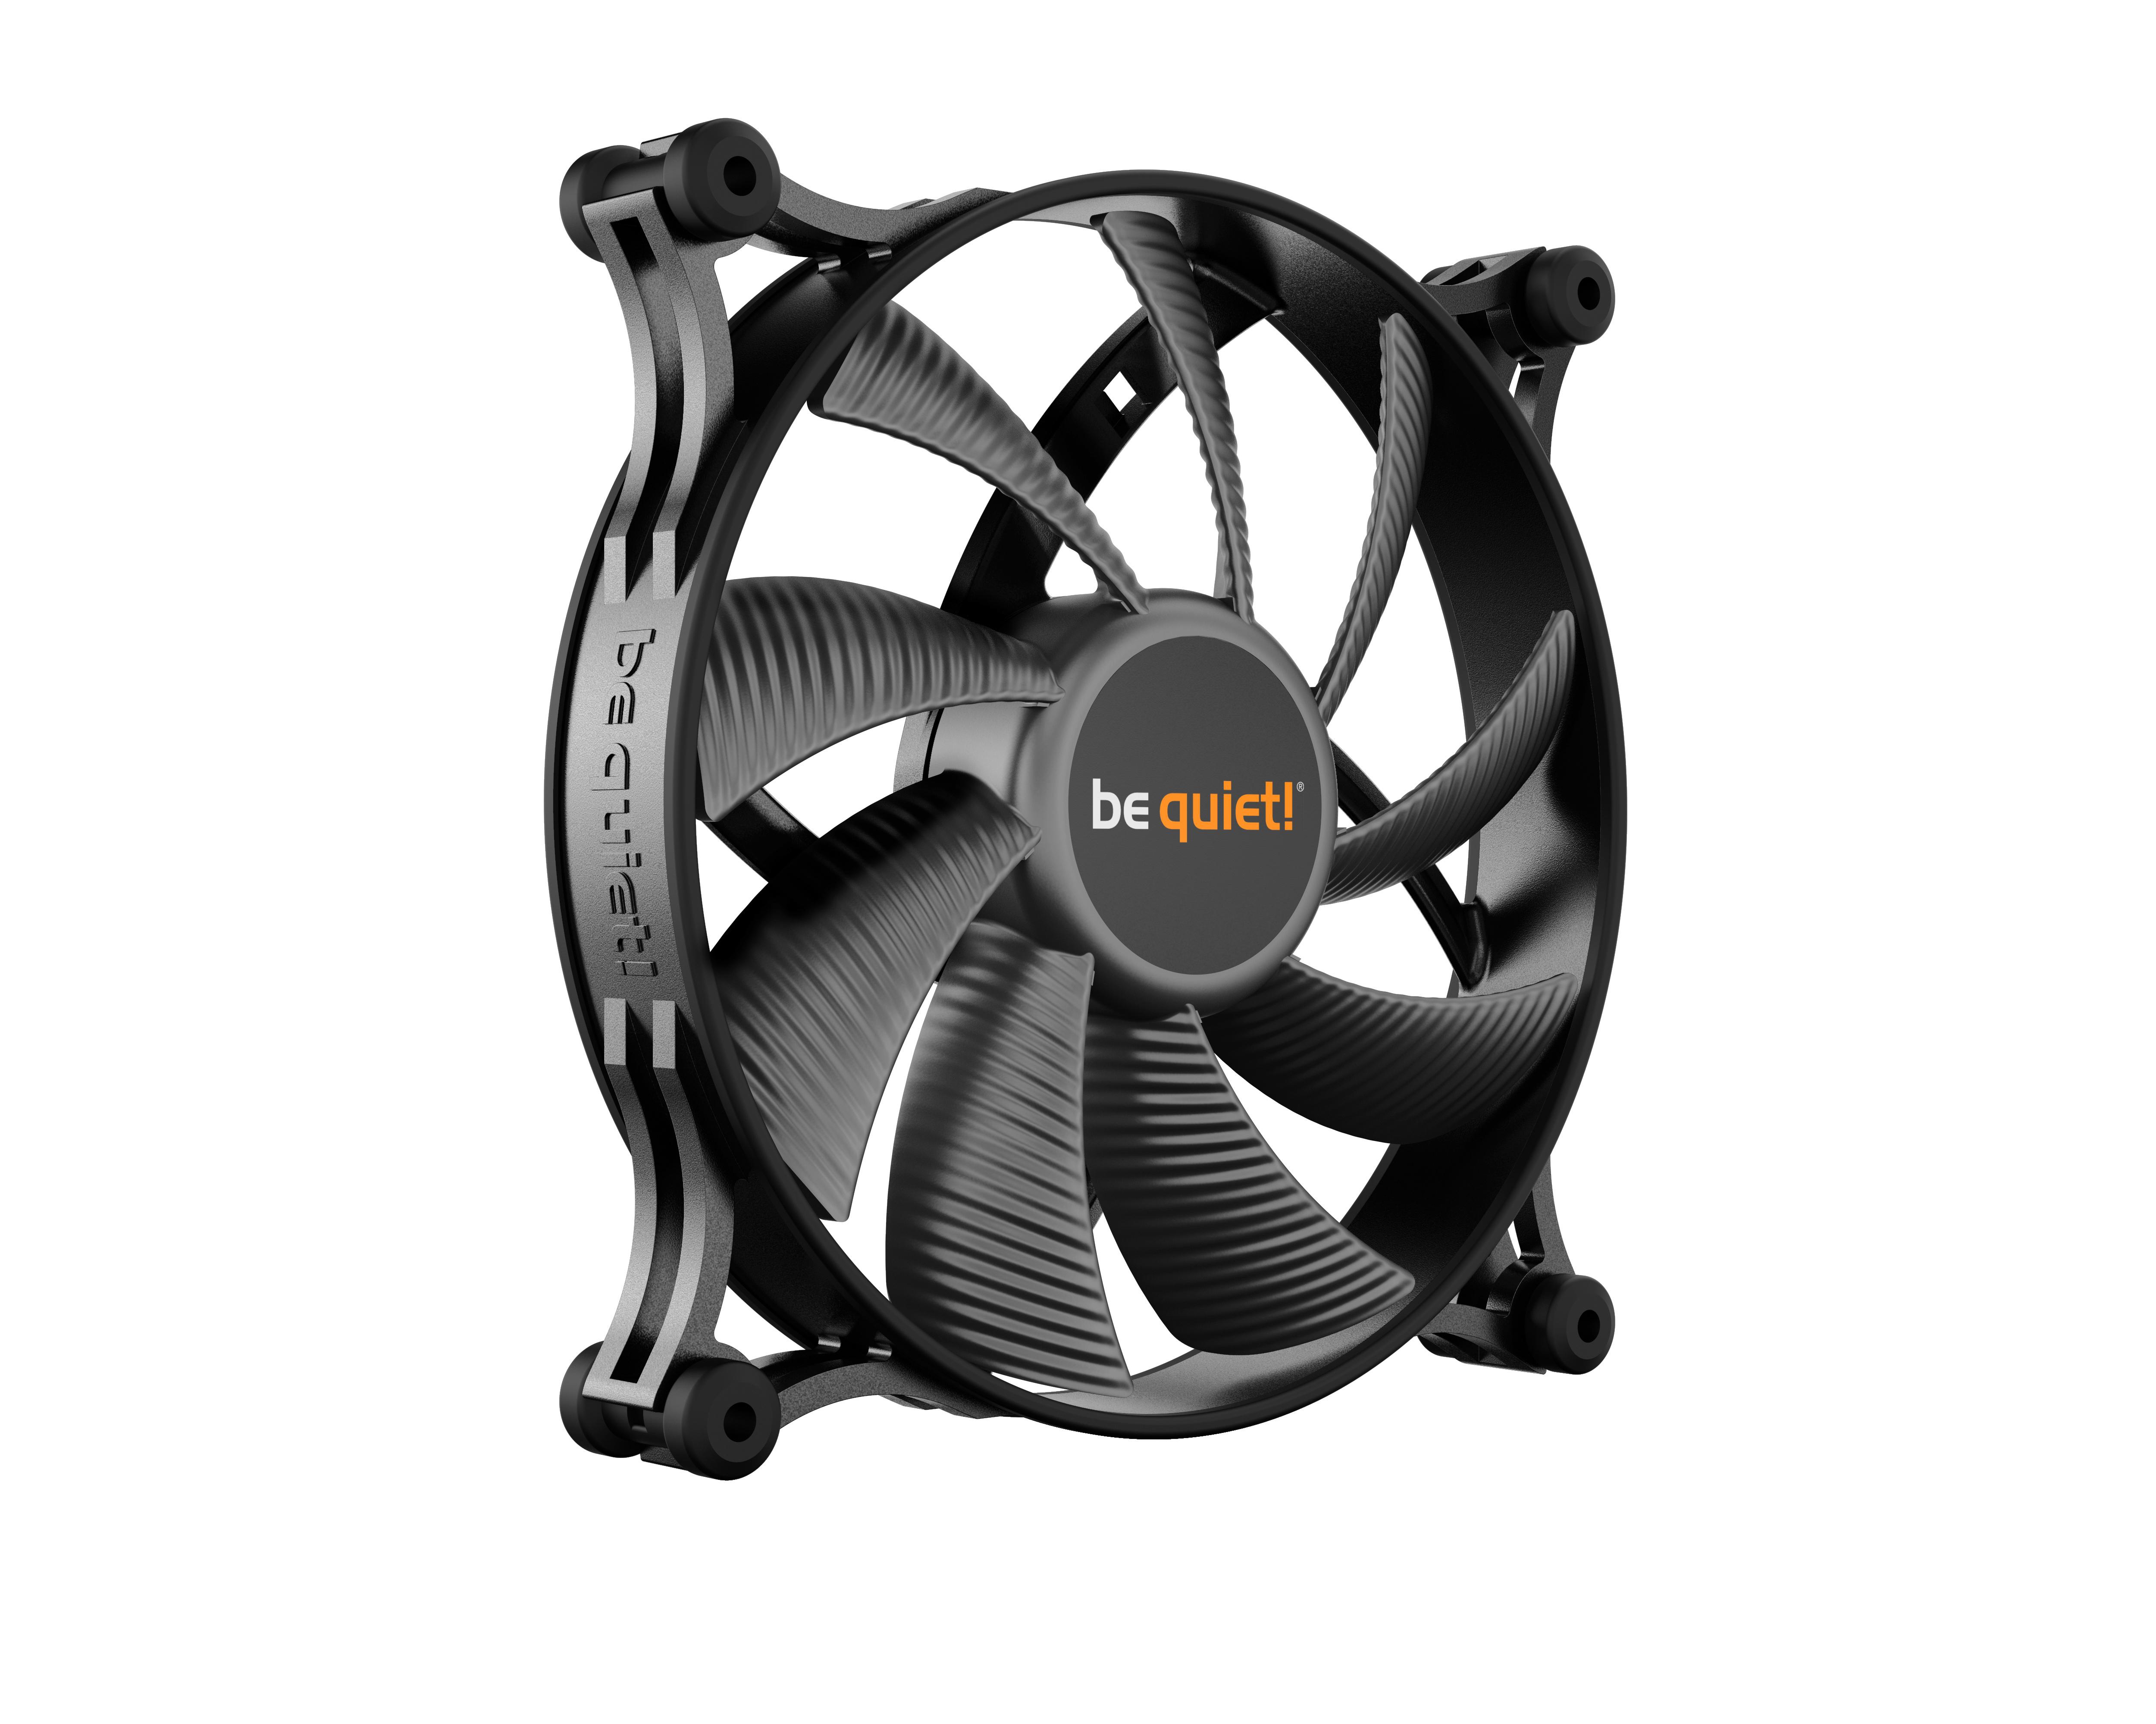 be quiet! Shadow Wings 2 140mm, 140x140x25, 900 rpm, 14,7 dB, 49,8 cfm, 3 pin